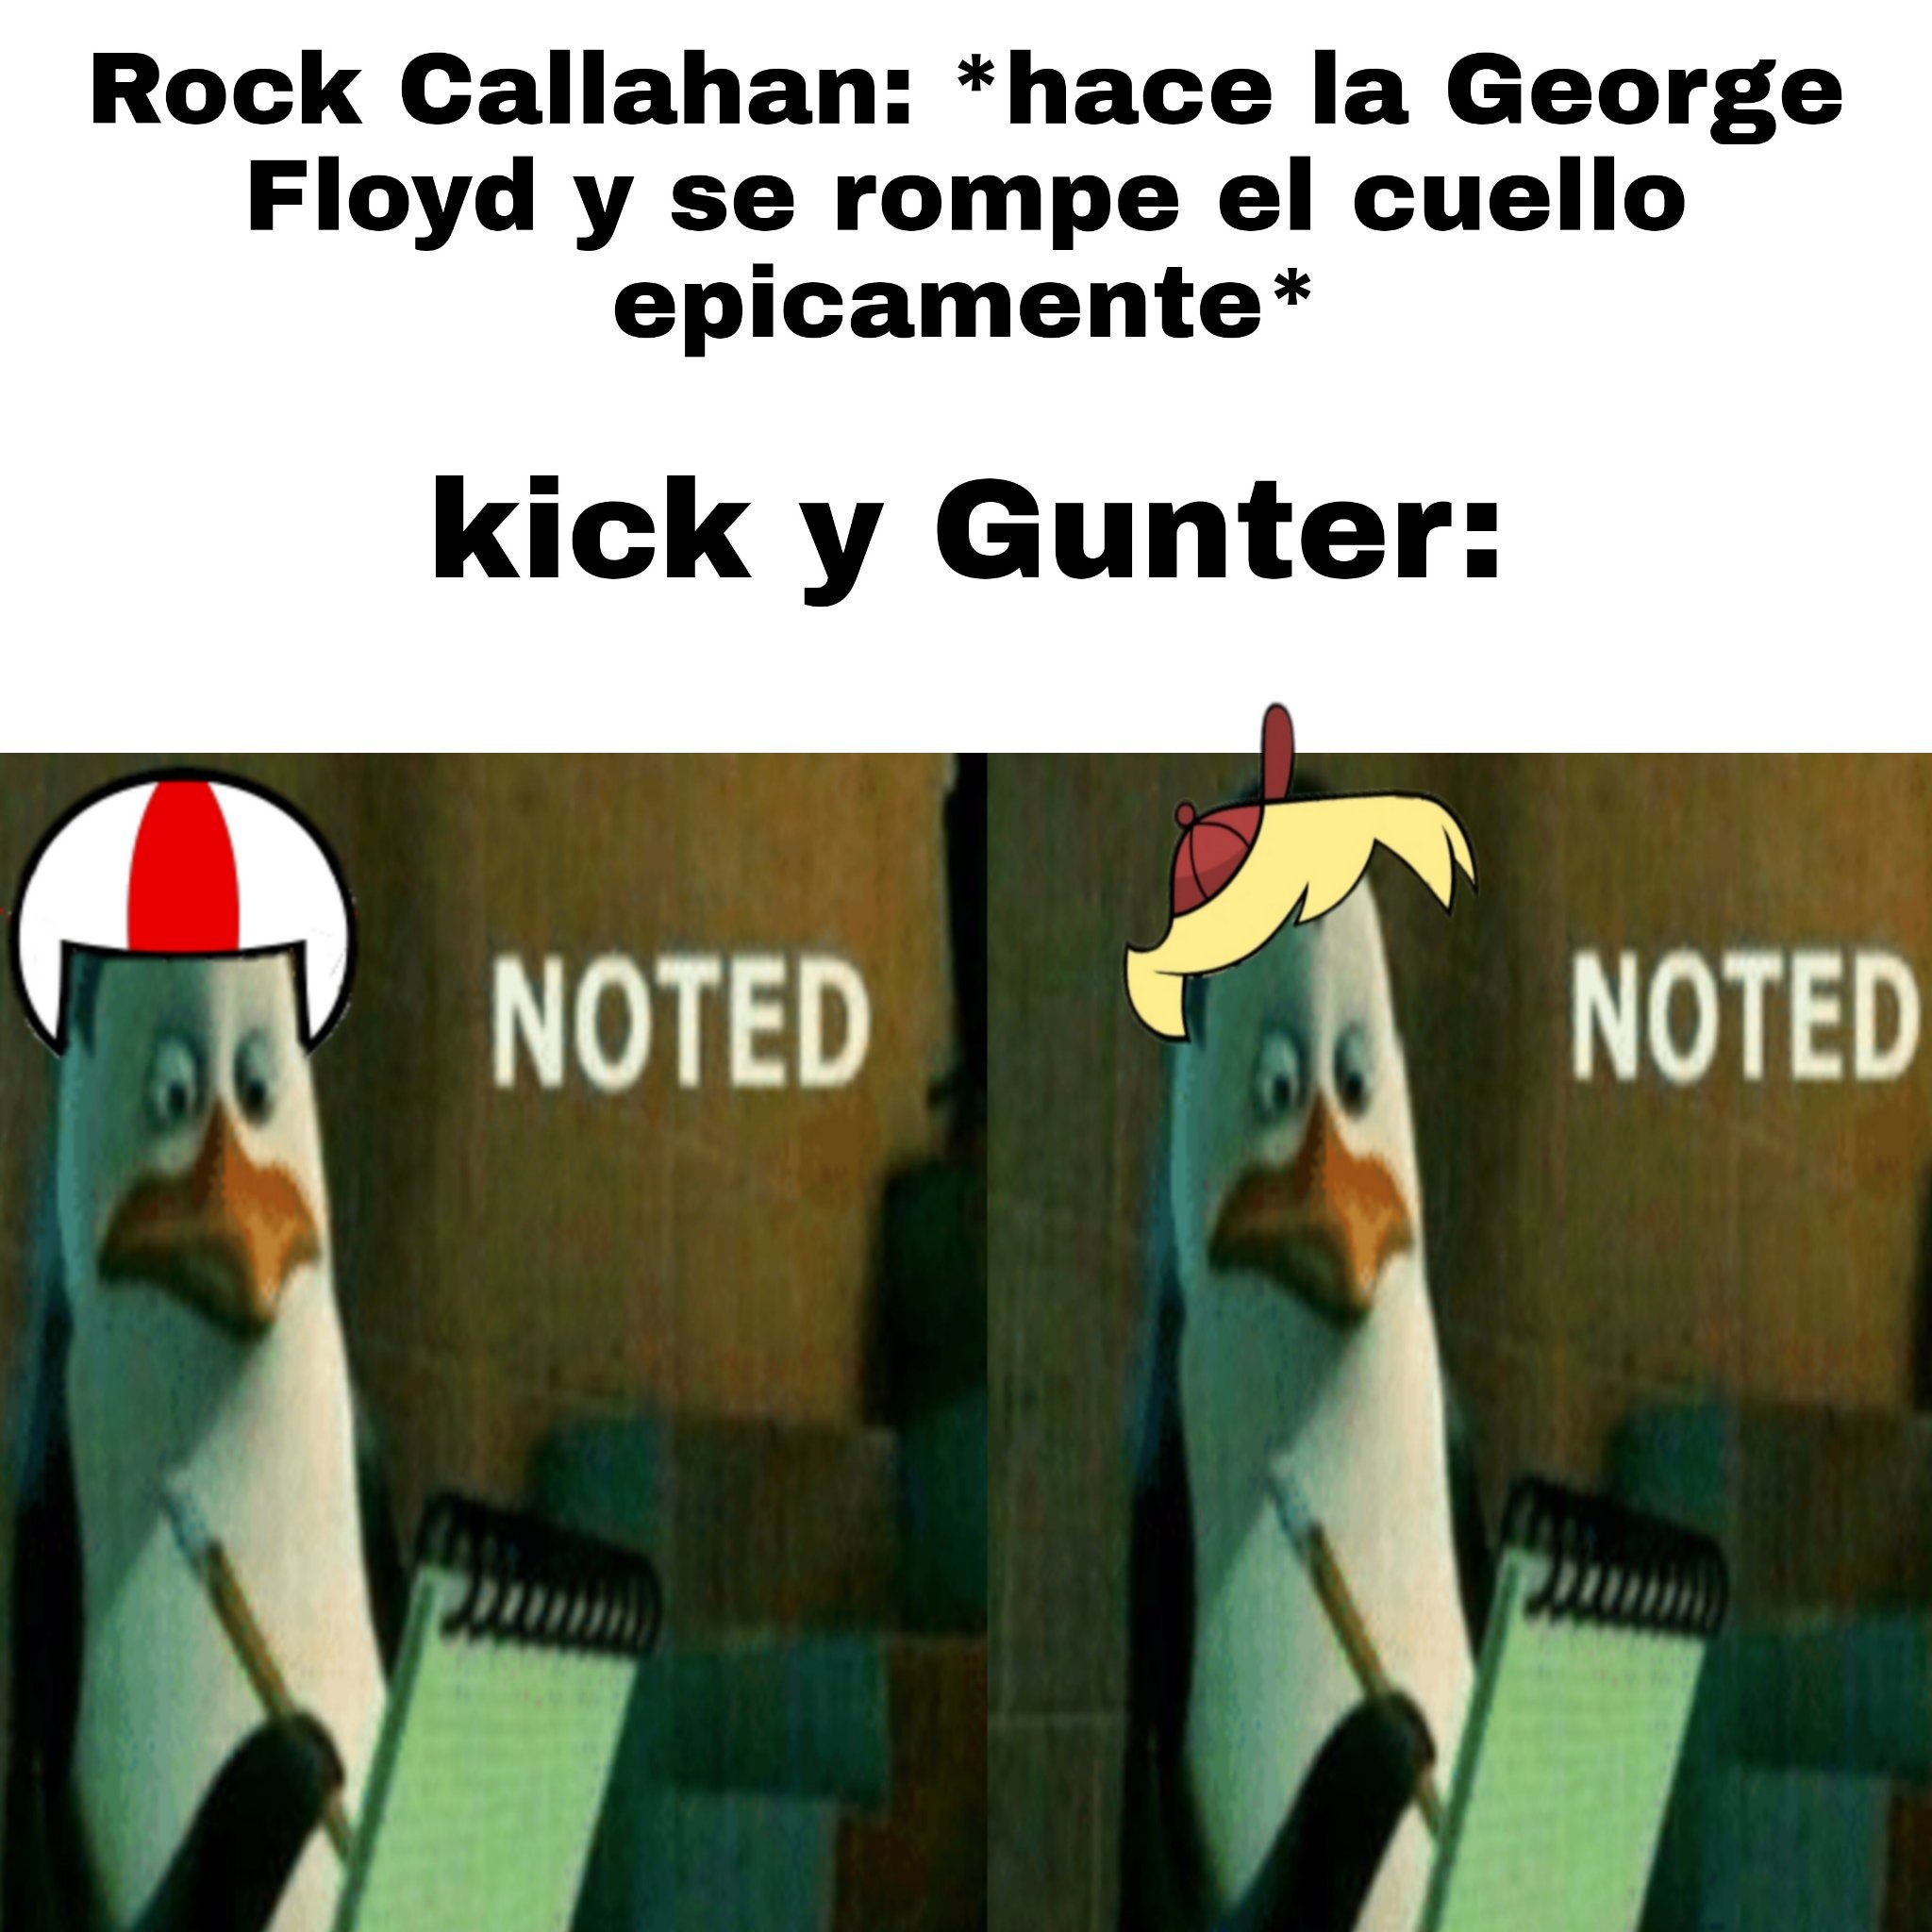 Un capo el rock Callahan - meme